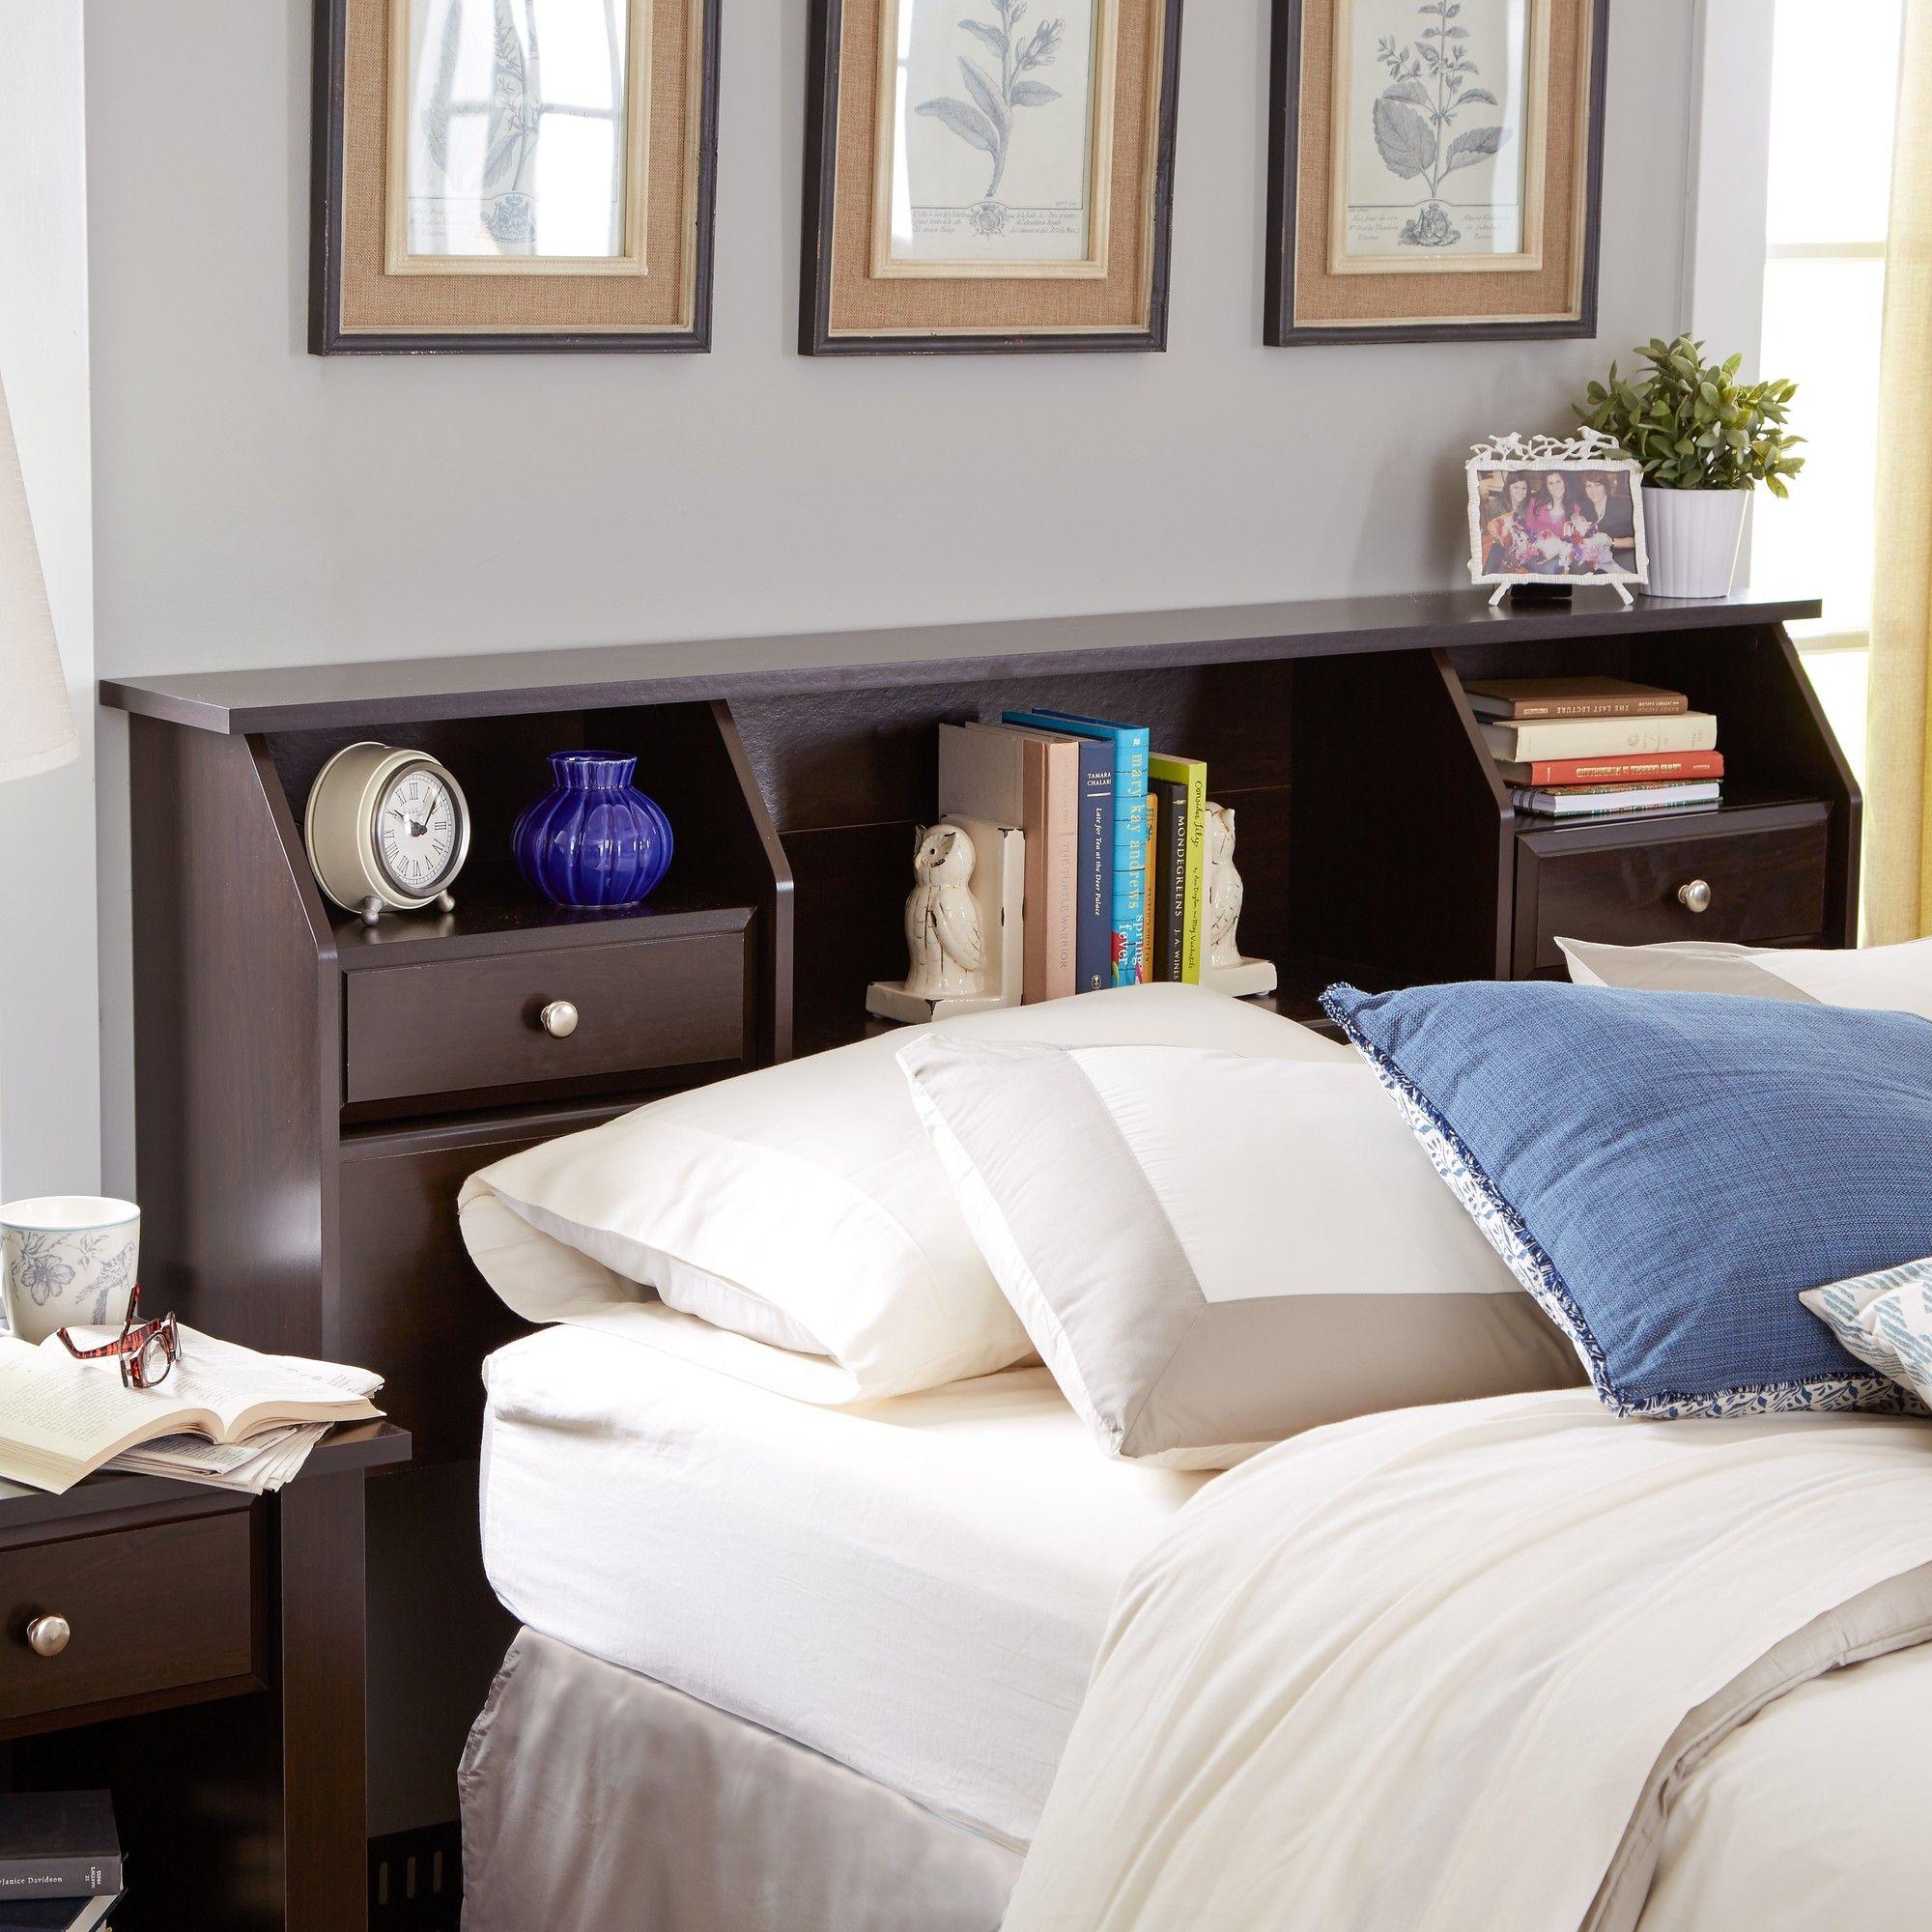 Olney Bookcase Headboard Bookcase Headboard Headboard Storage Bookcase Headboard Queen